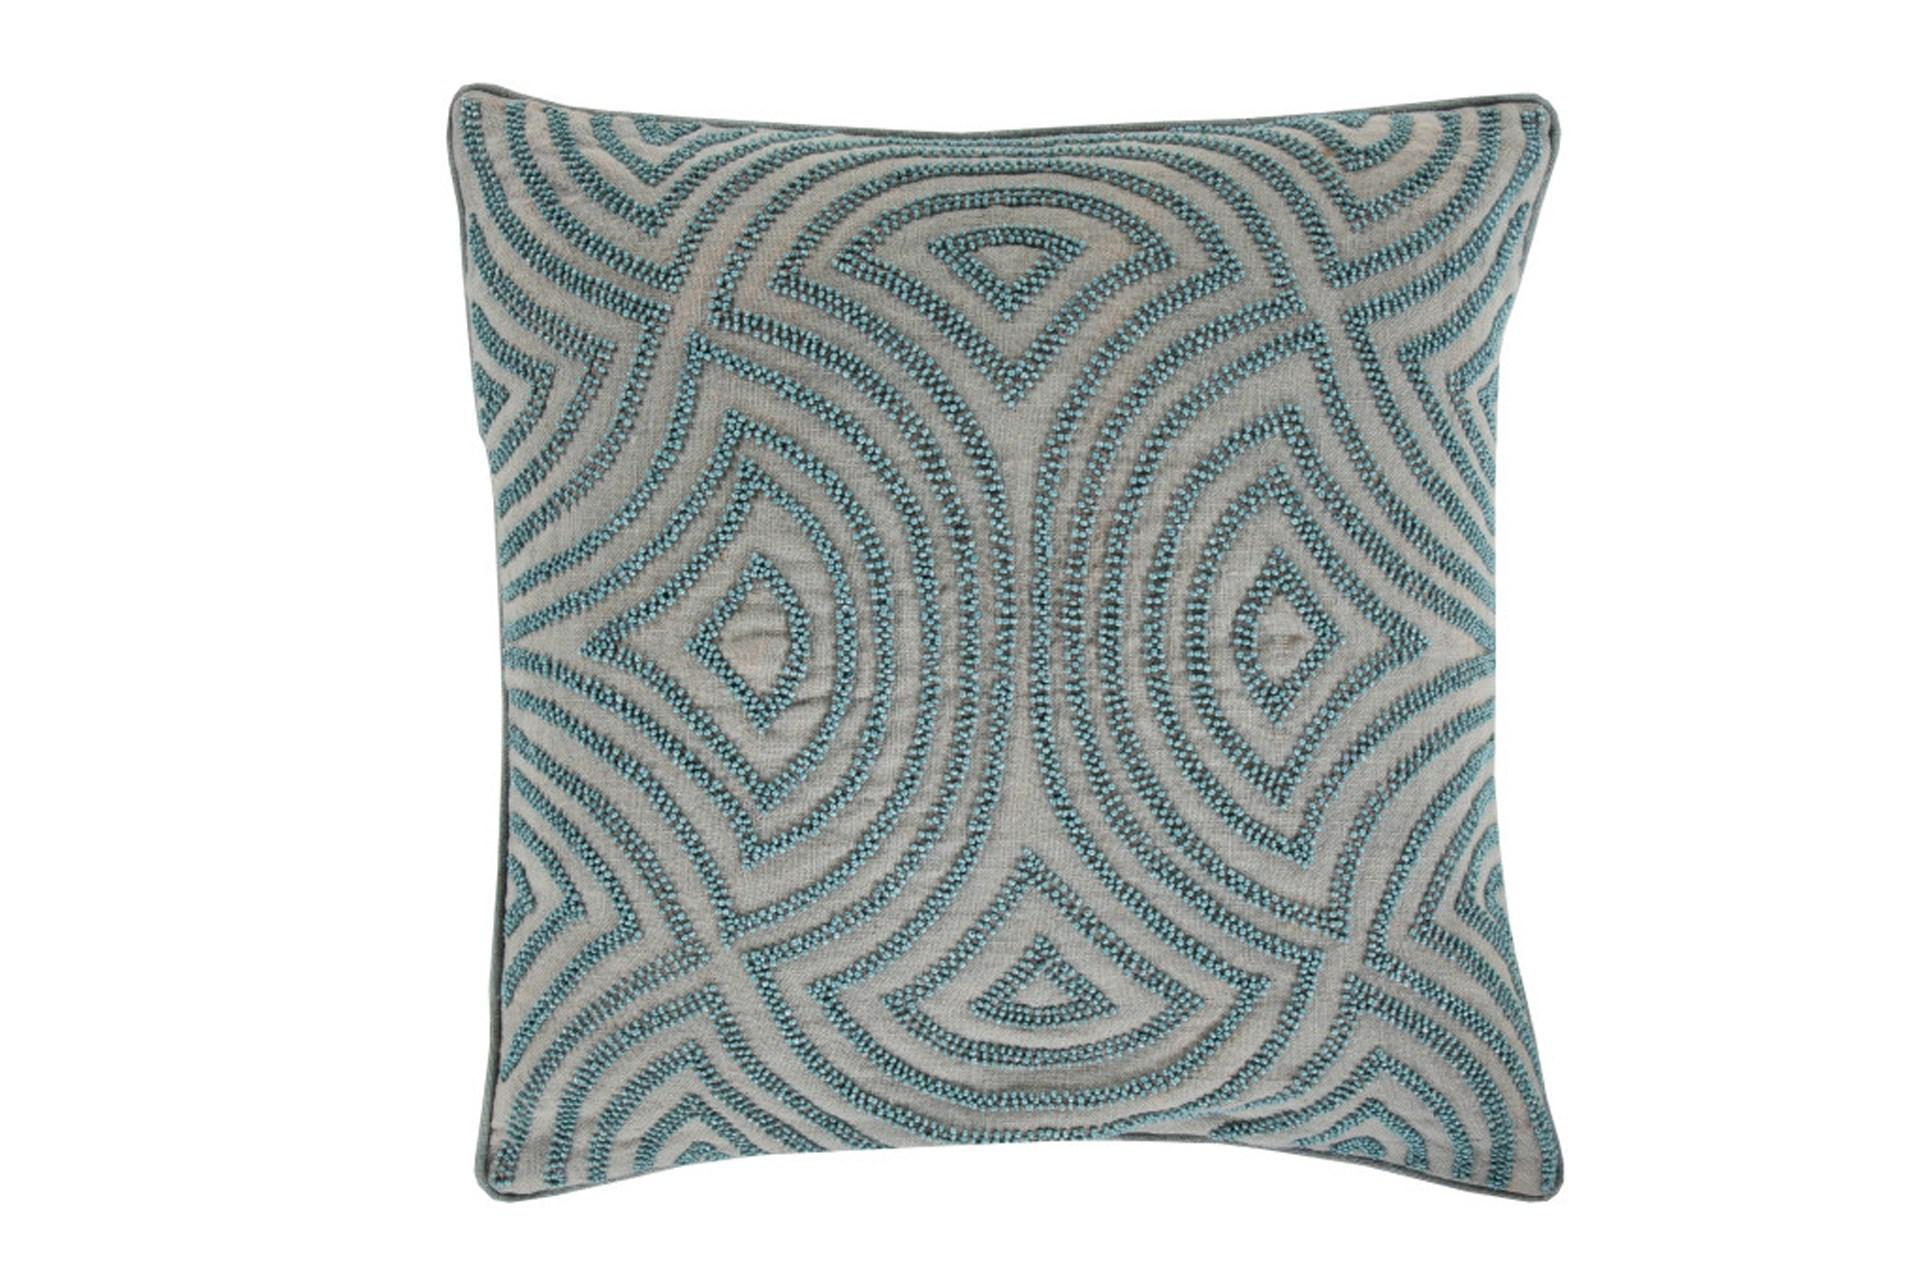 Decorative Pillows Living Spaces : Accent Pillow-Zinnia Blue 18X18 Living Spaces